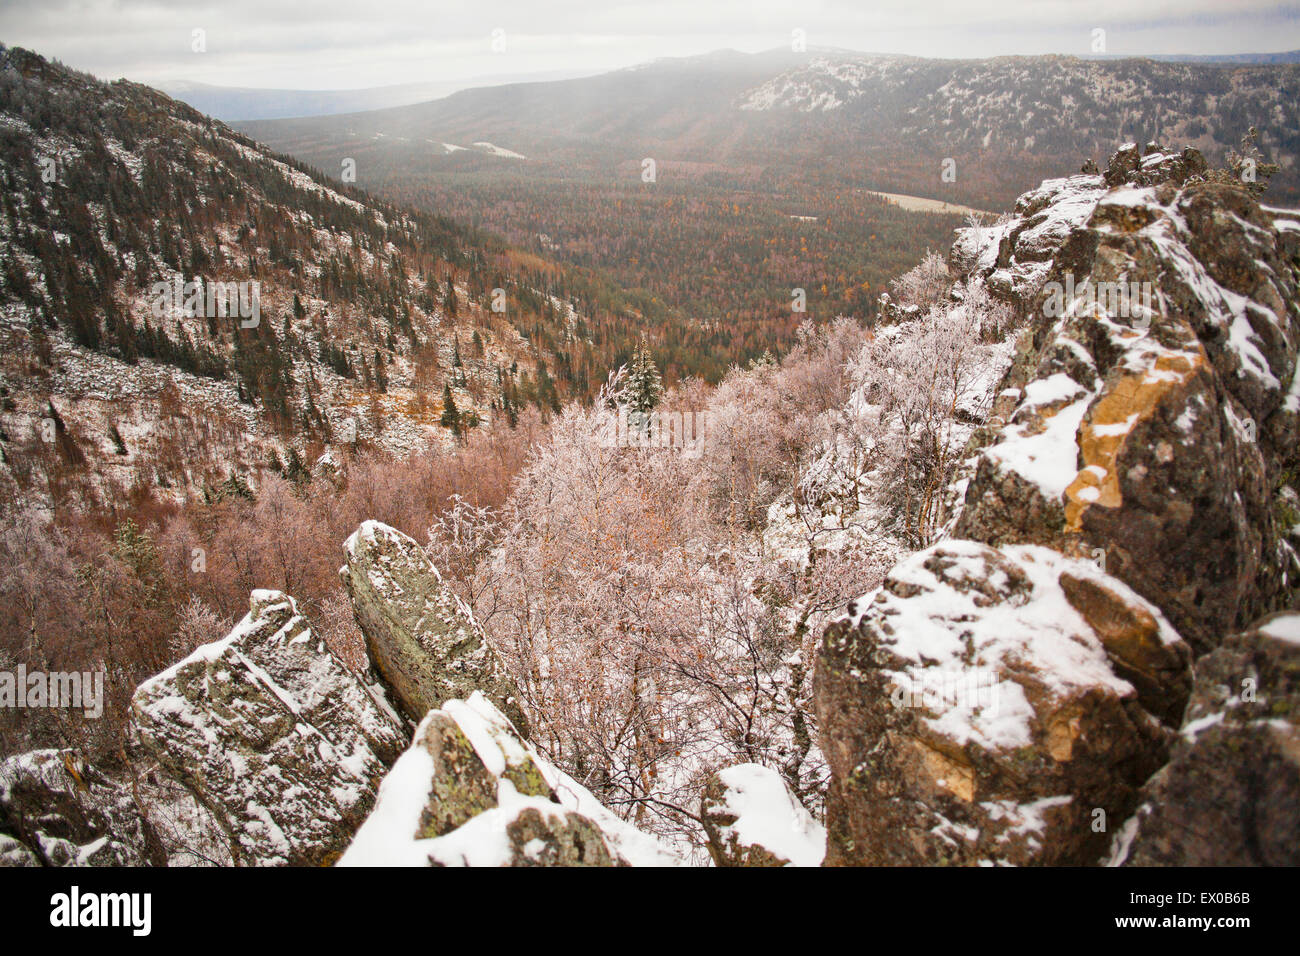 Snow covered rocks and mountains, Sarsy Village, Sverdlovsk Oblast, Russia - Stock Image